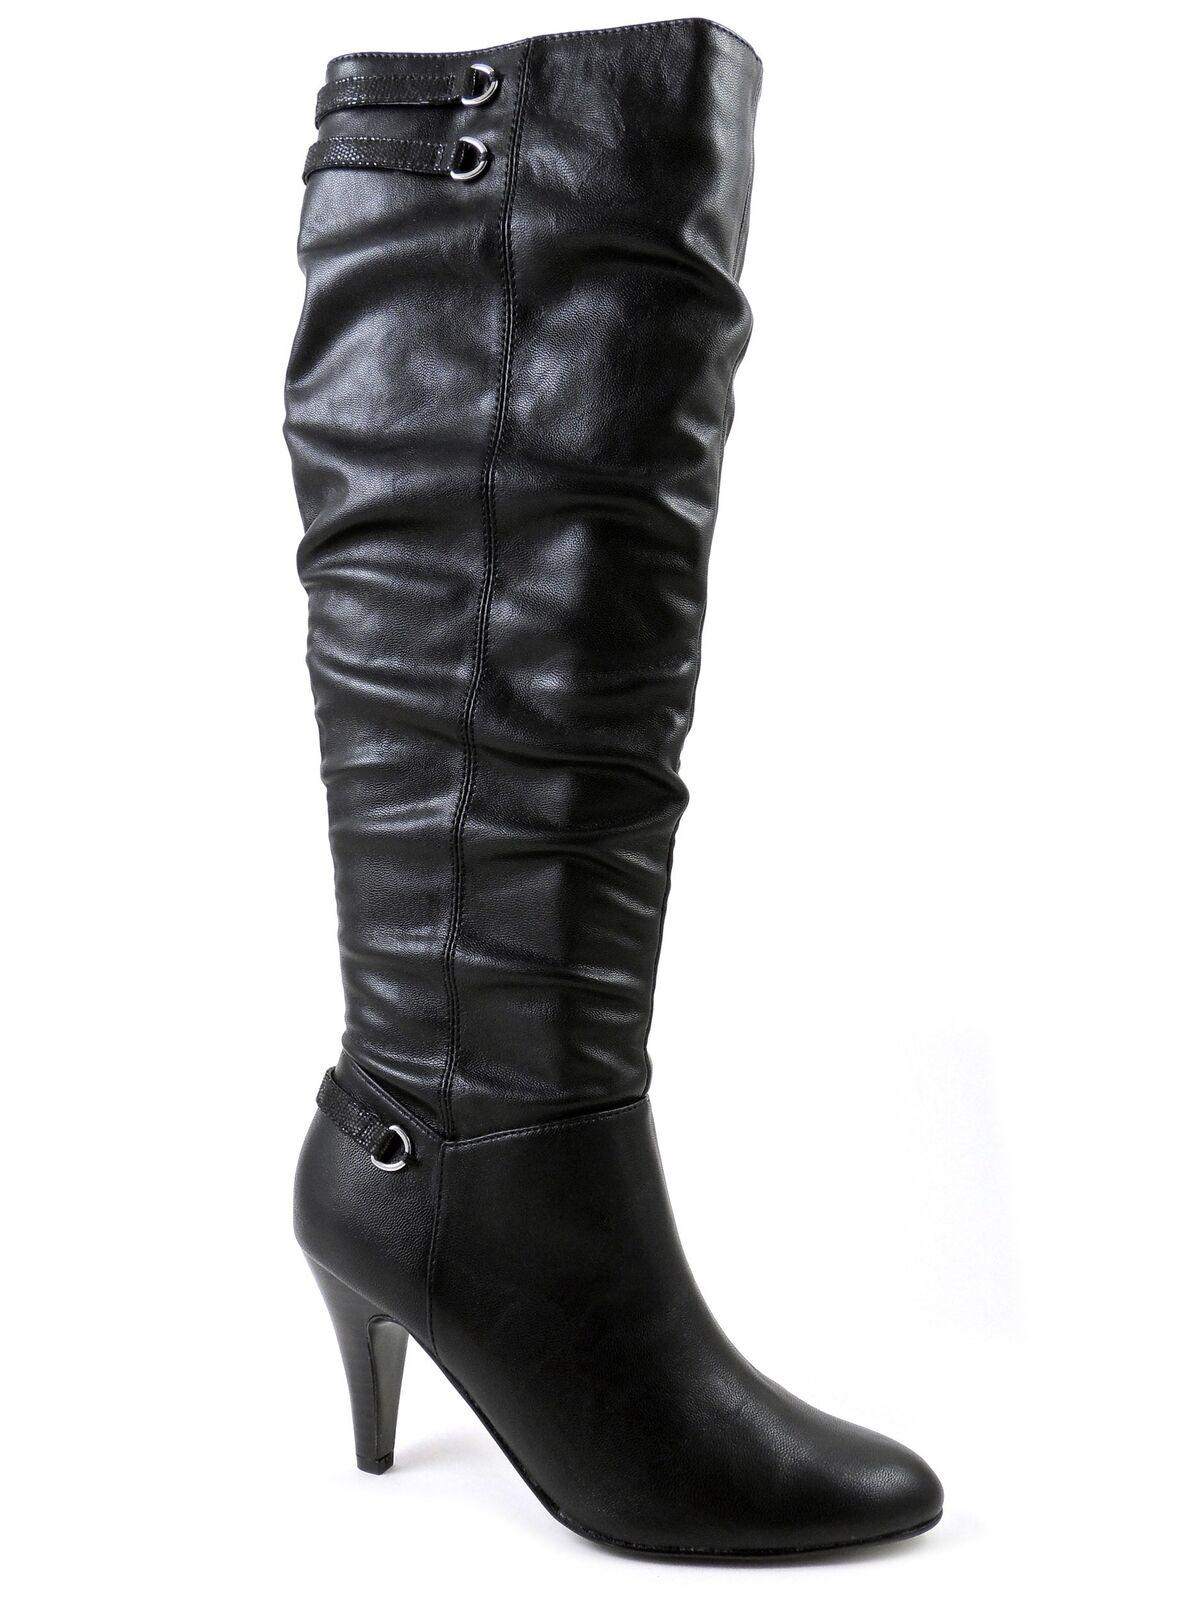 Alfani Women's Taye Knee-High Boots Black Leather Size 5 M